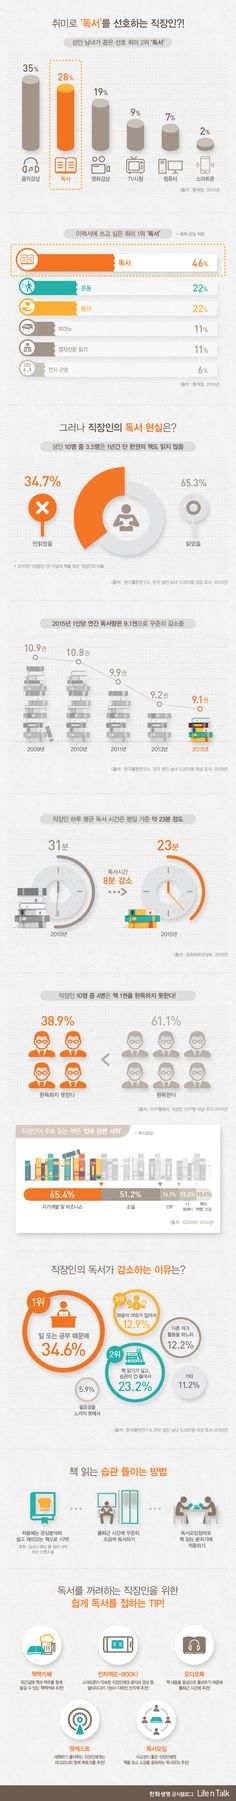 [Infographic] 직장인들의 독서에 관한 인포그래픽